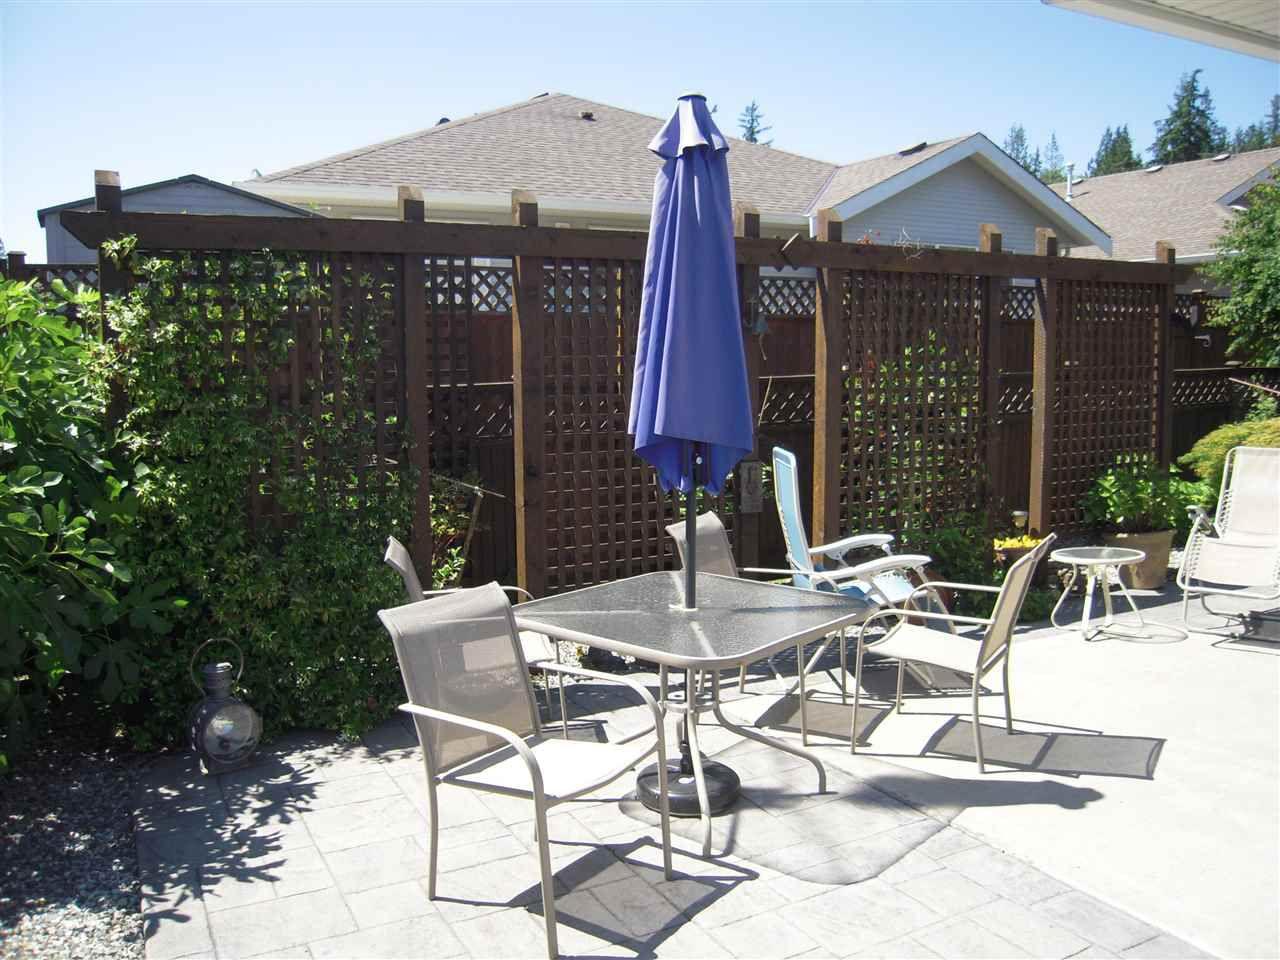 Photo 5: Photos: 5735 EMILY Way in Sechelt: Sechelt District House for sale (Sunshine Coast)  : MLS®# R2179124